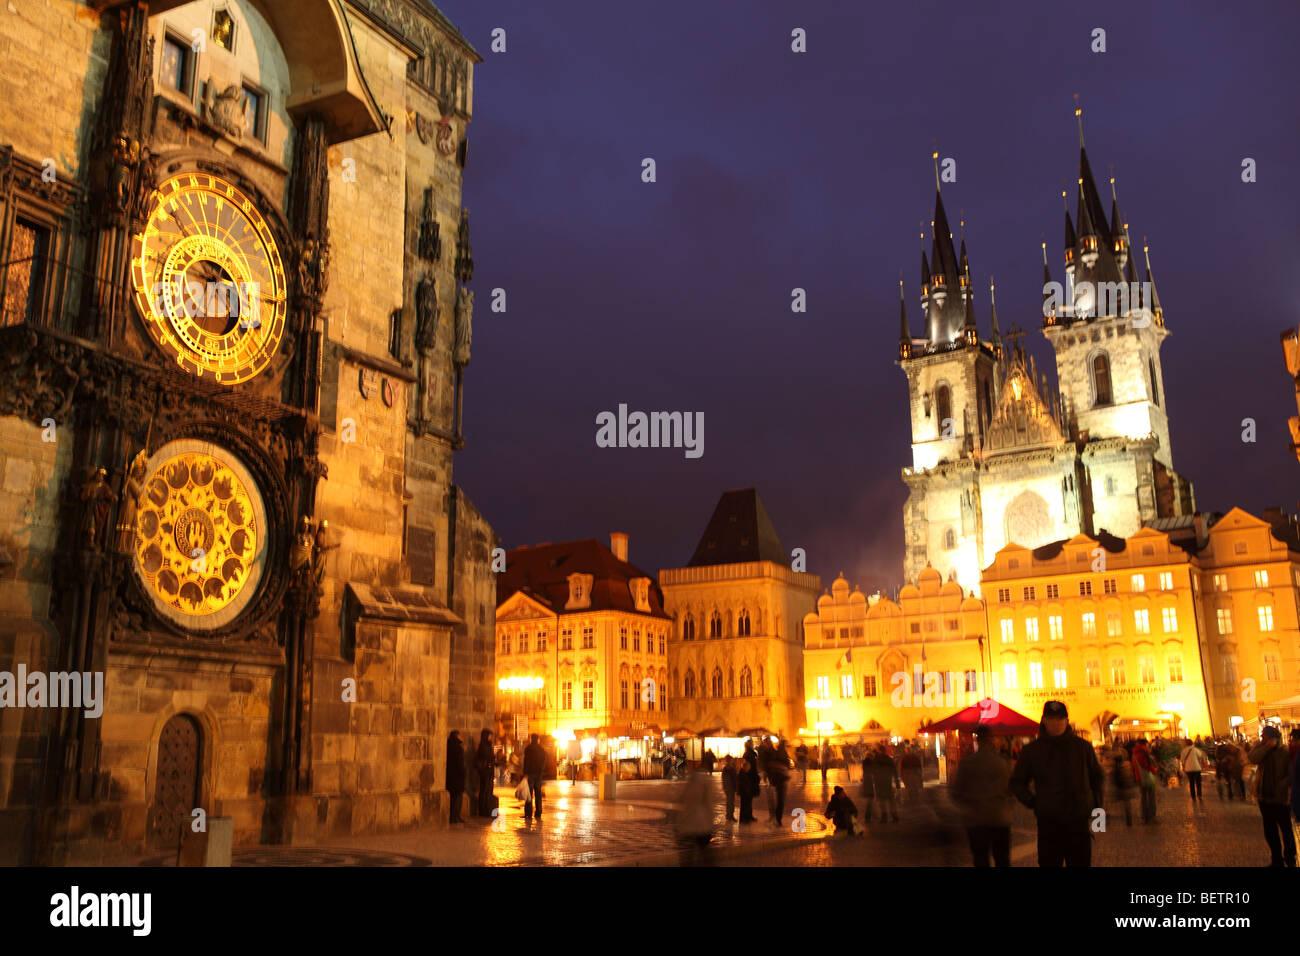 Old Town Square Prague at dusk - Stock Image